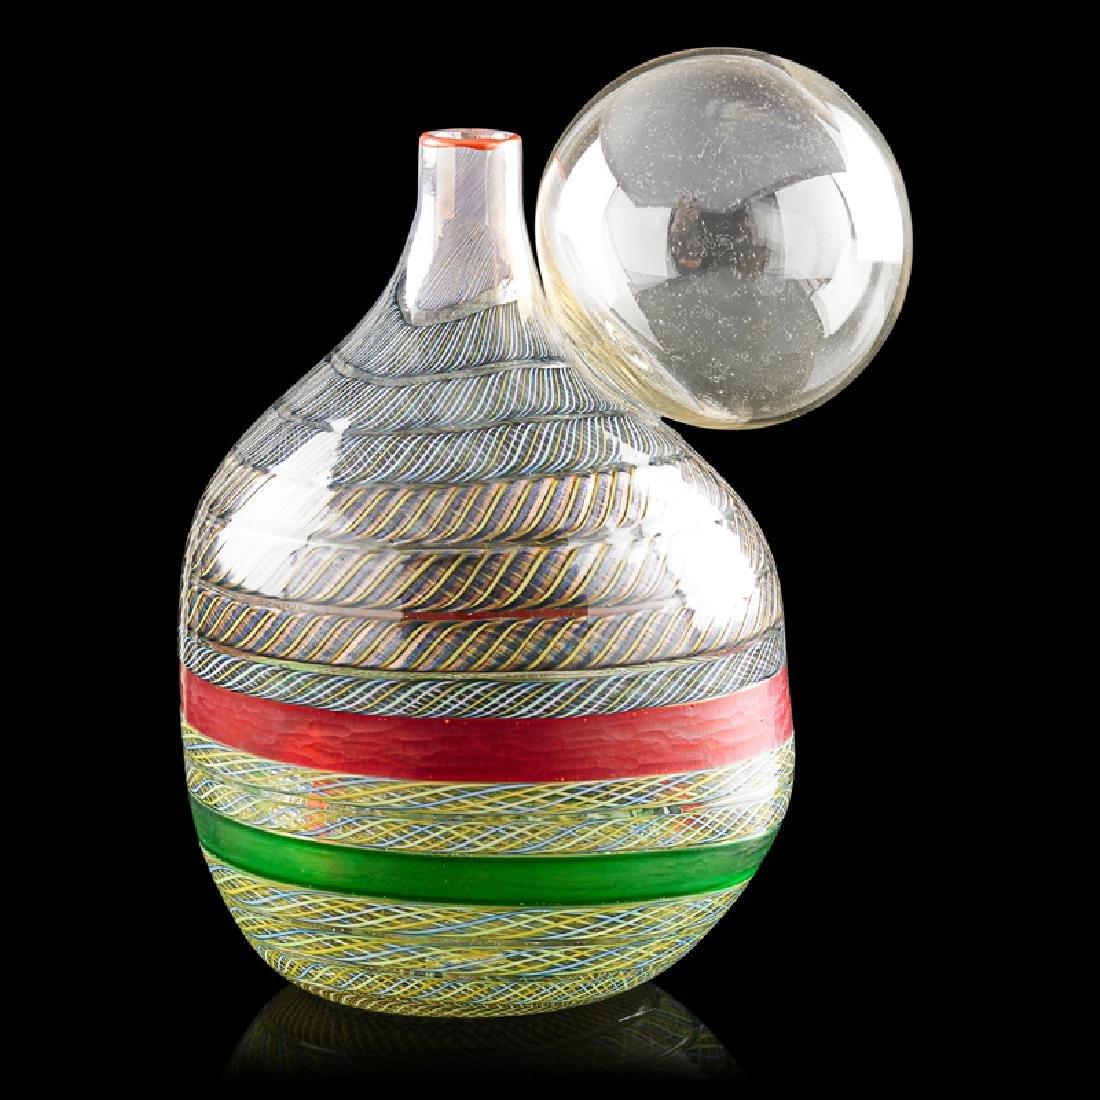 YOICHI OHIRA Vase with drawing